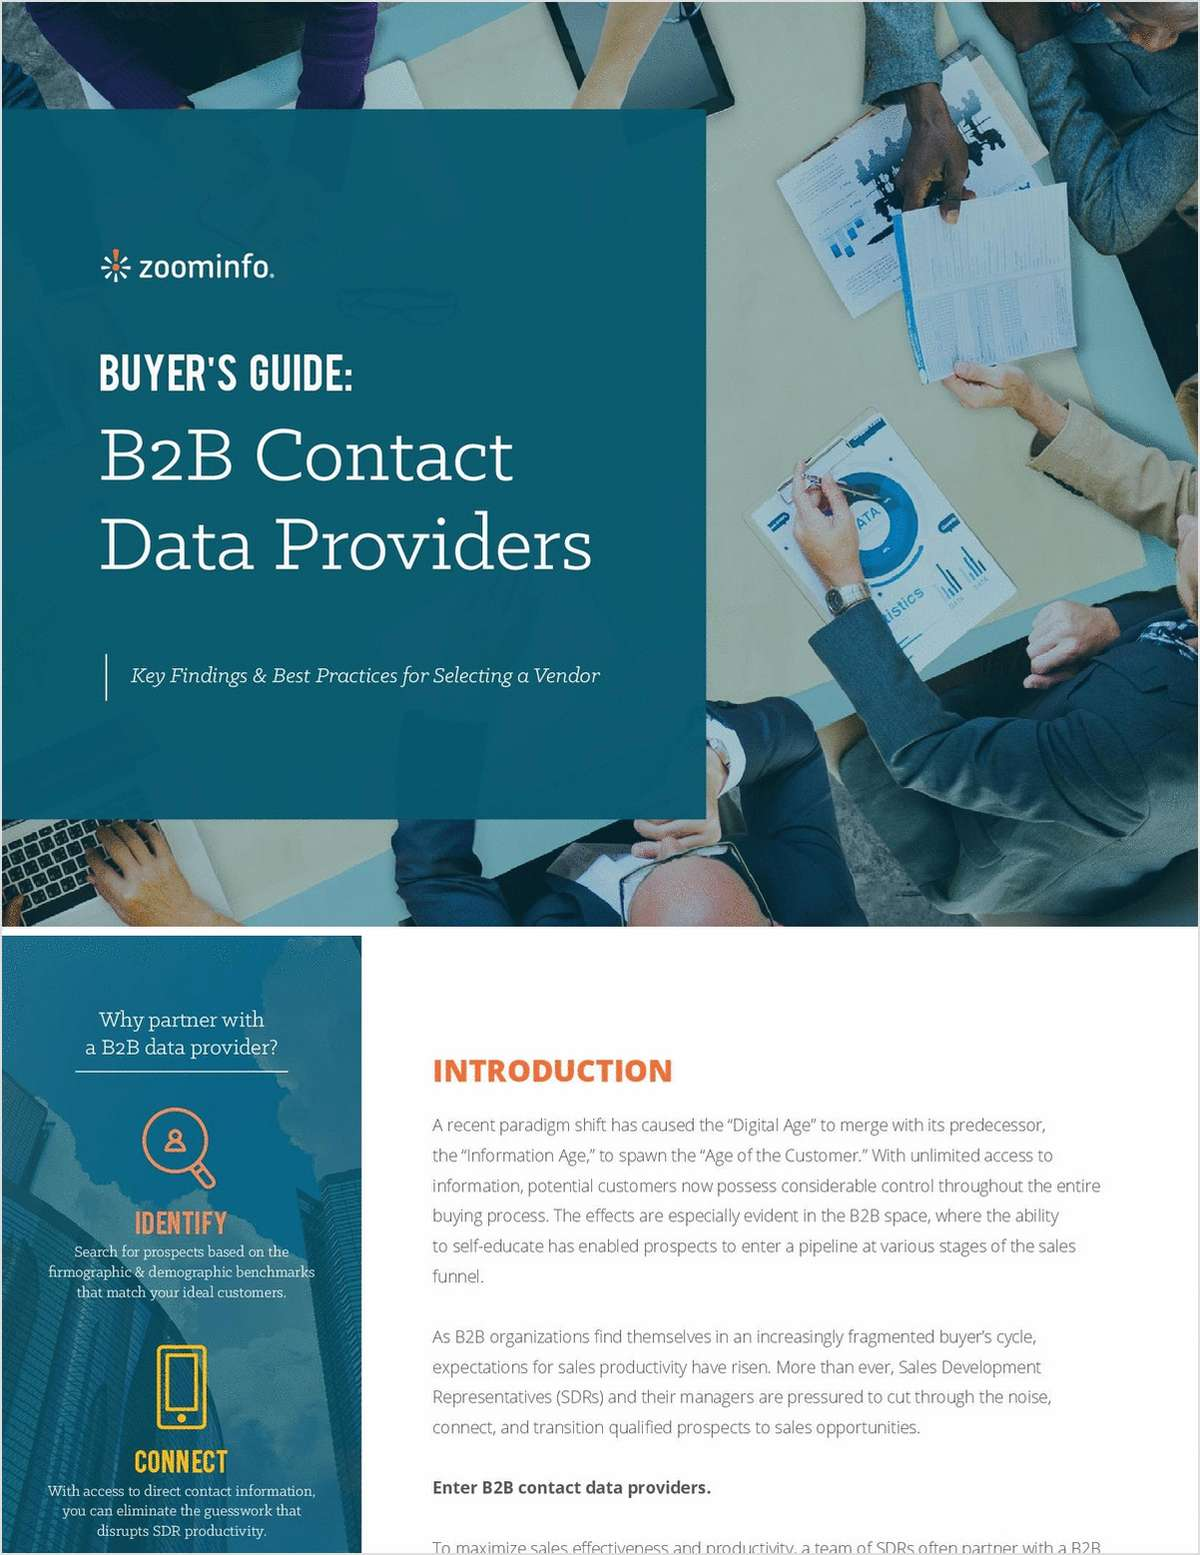 B2B Contact Data Providers